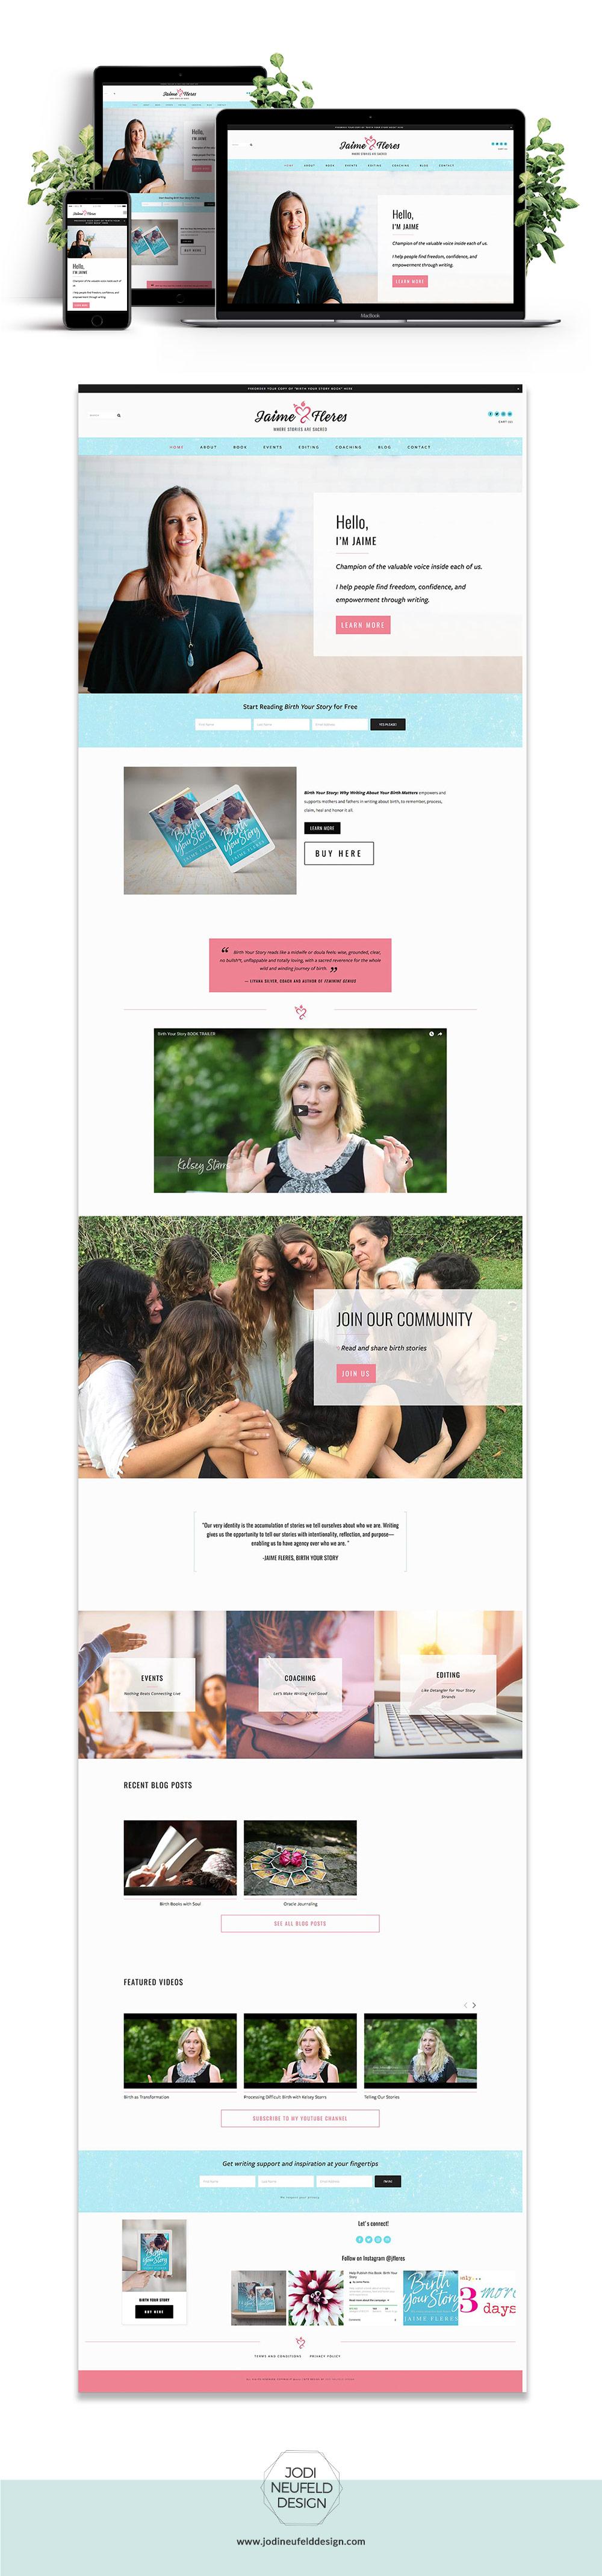 Jaime Fleres website | Squarespace web design by Jodi Neufeld Design